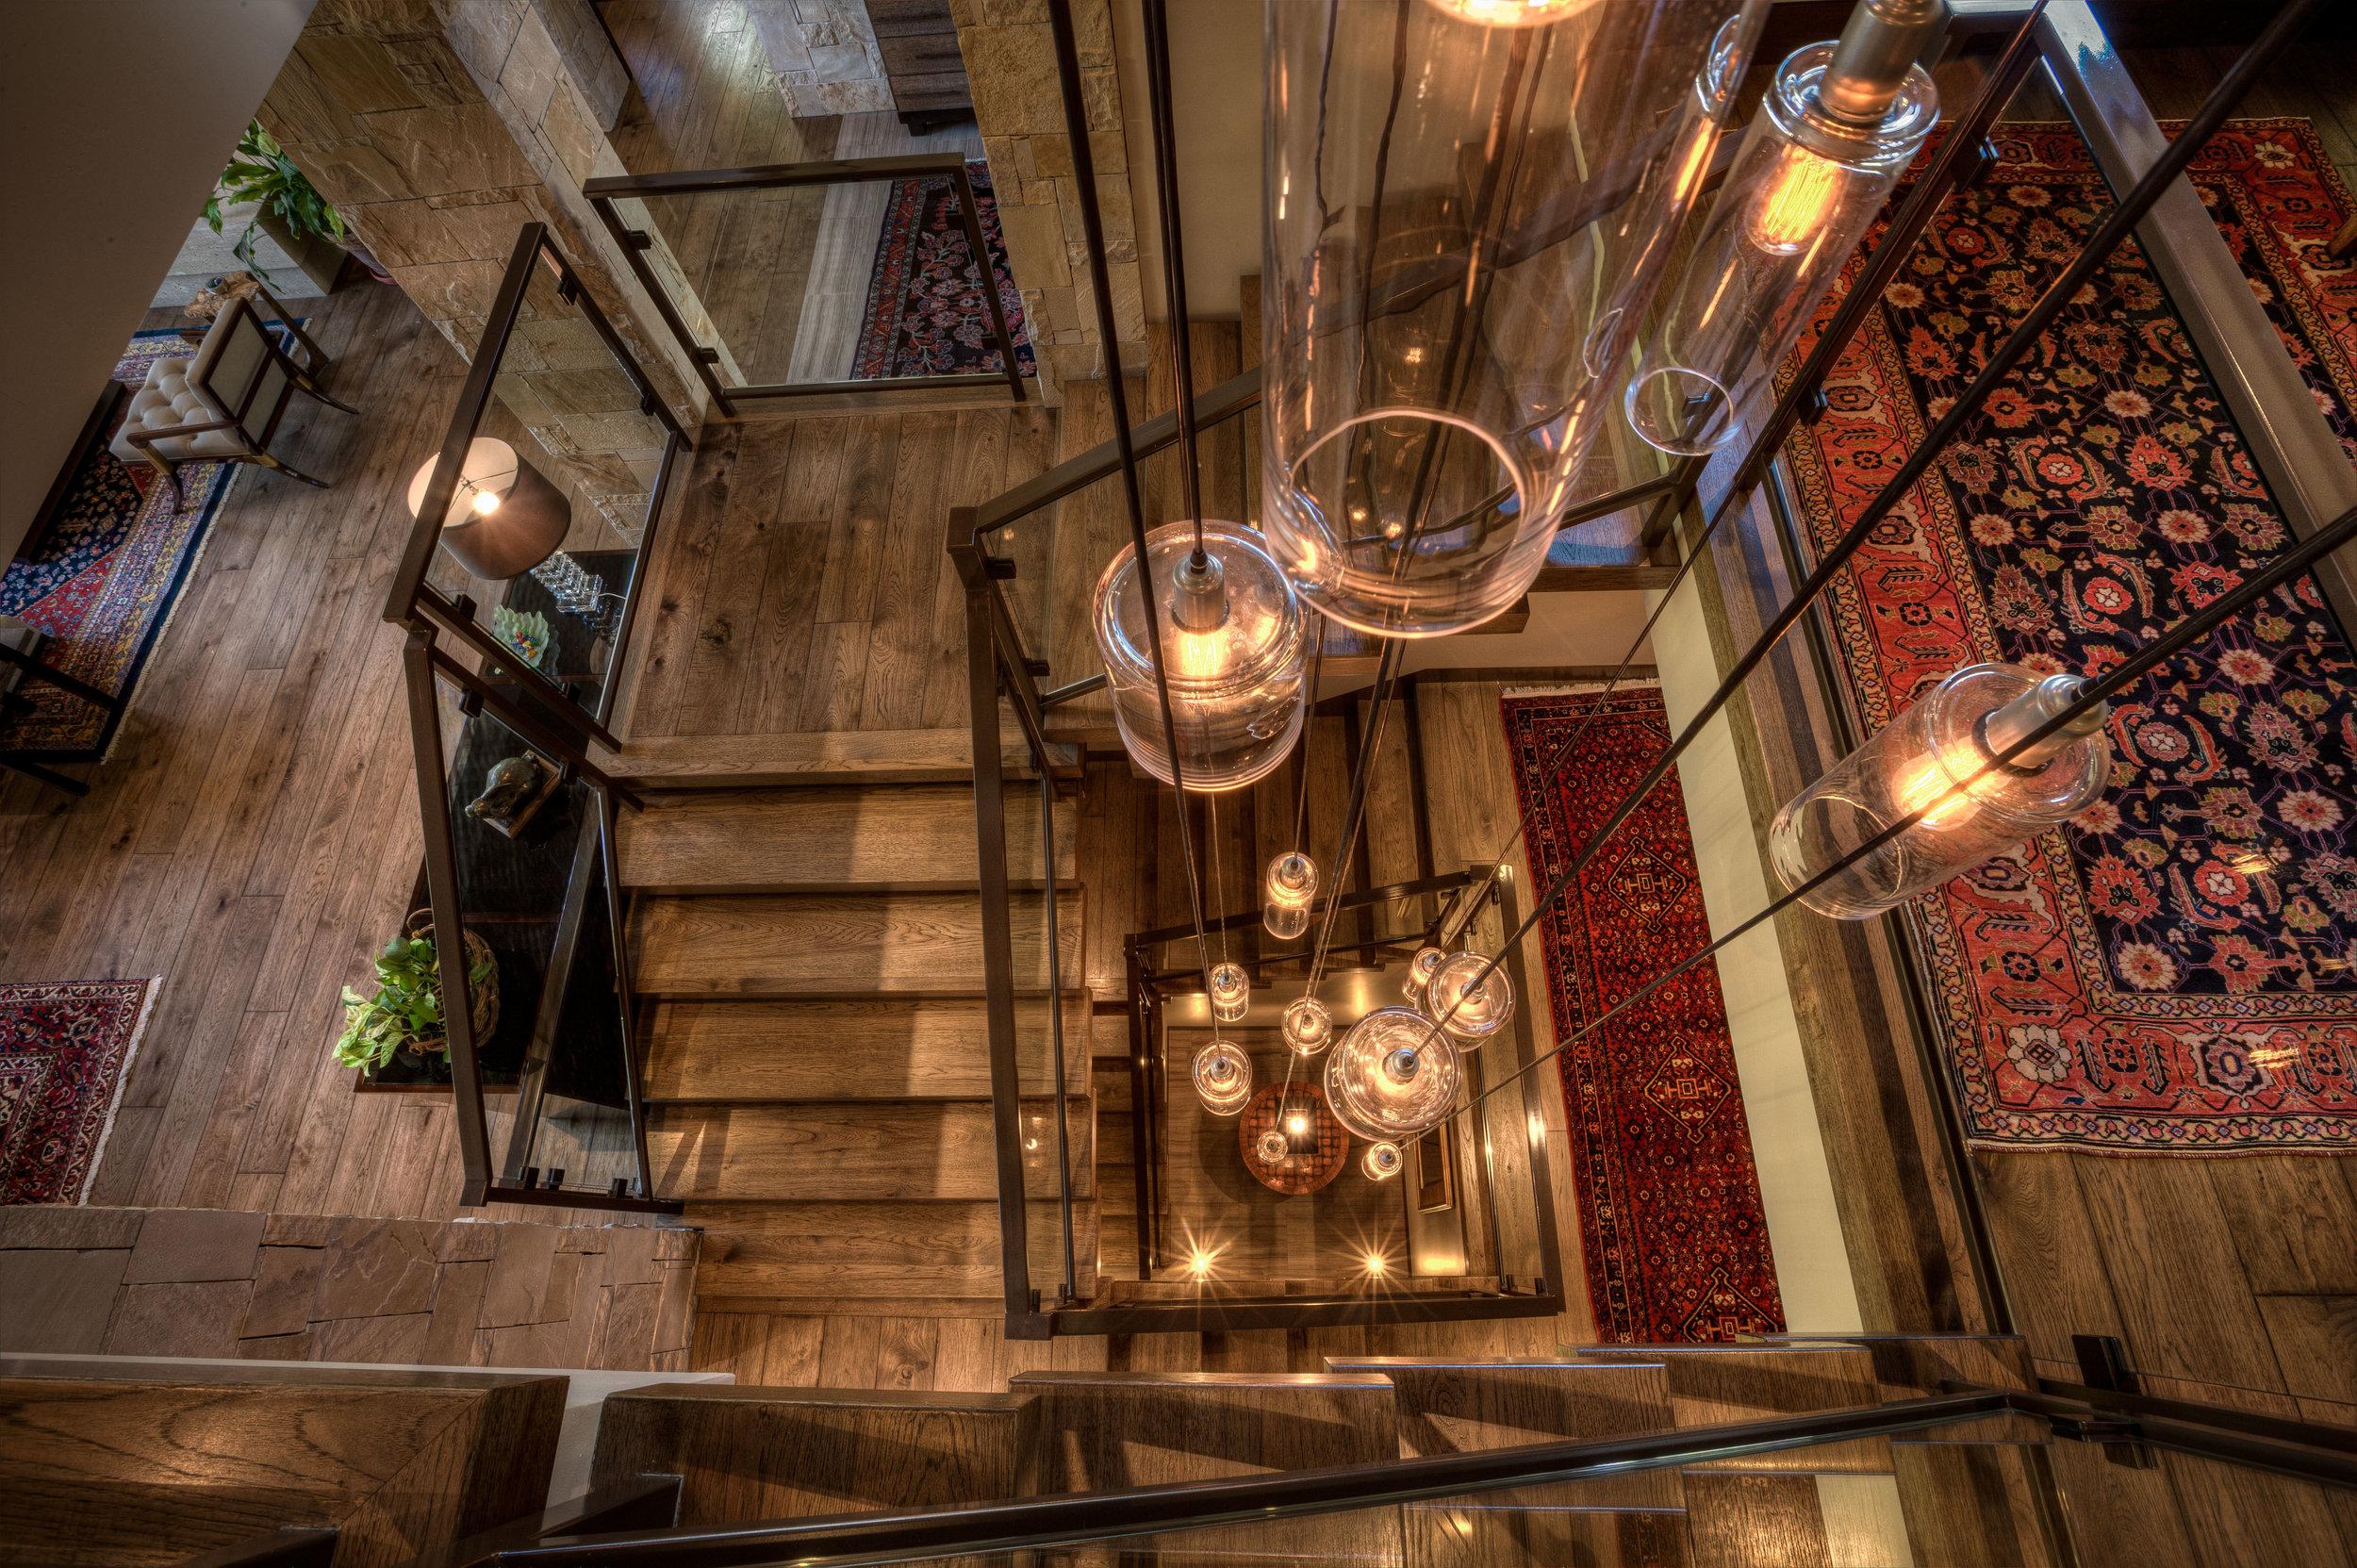 Custom Hammerton Studio Apothecary chandelier.